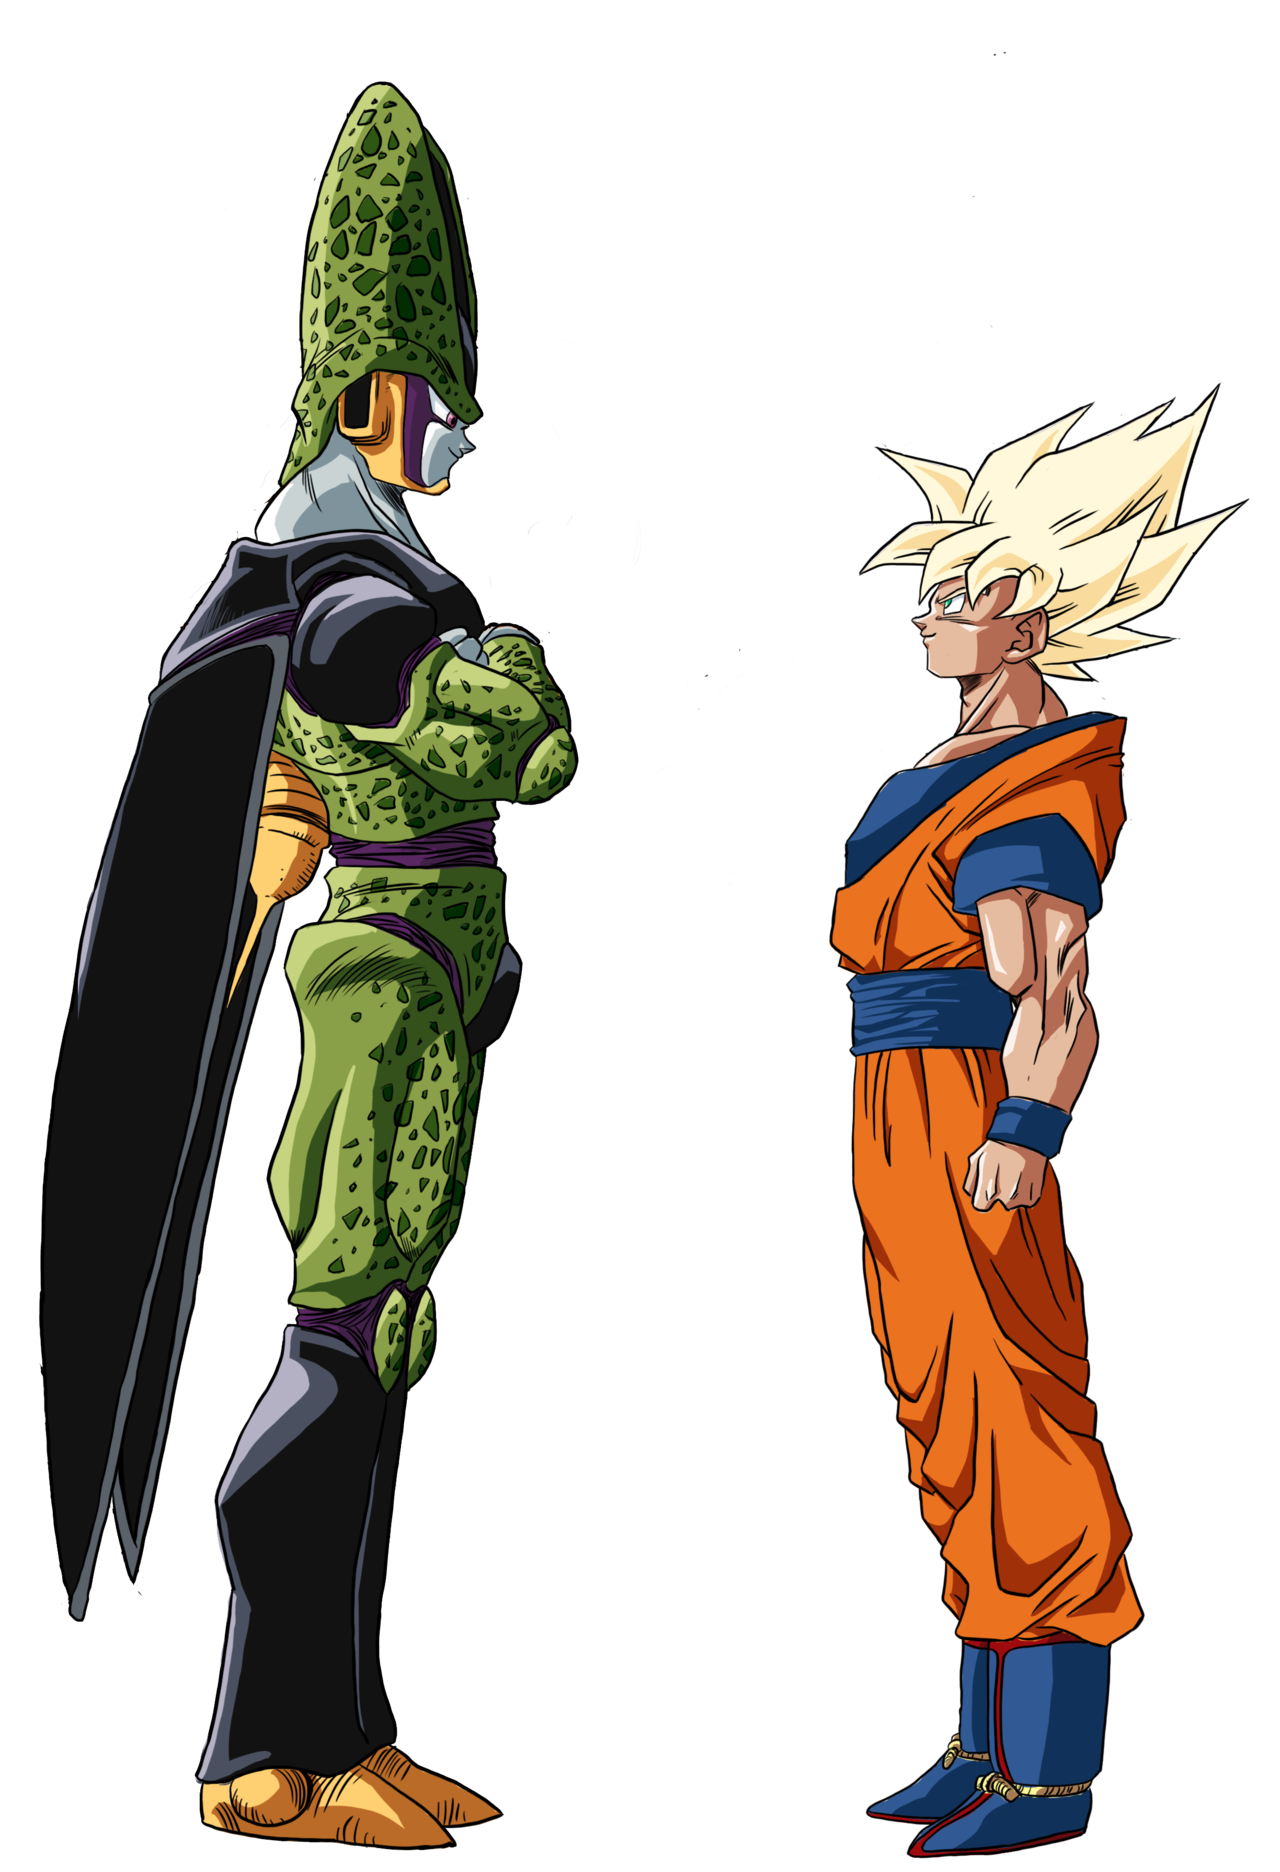 Goku Cell Color by RuokDbz98.deviantart.com on @DeviantArt ...